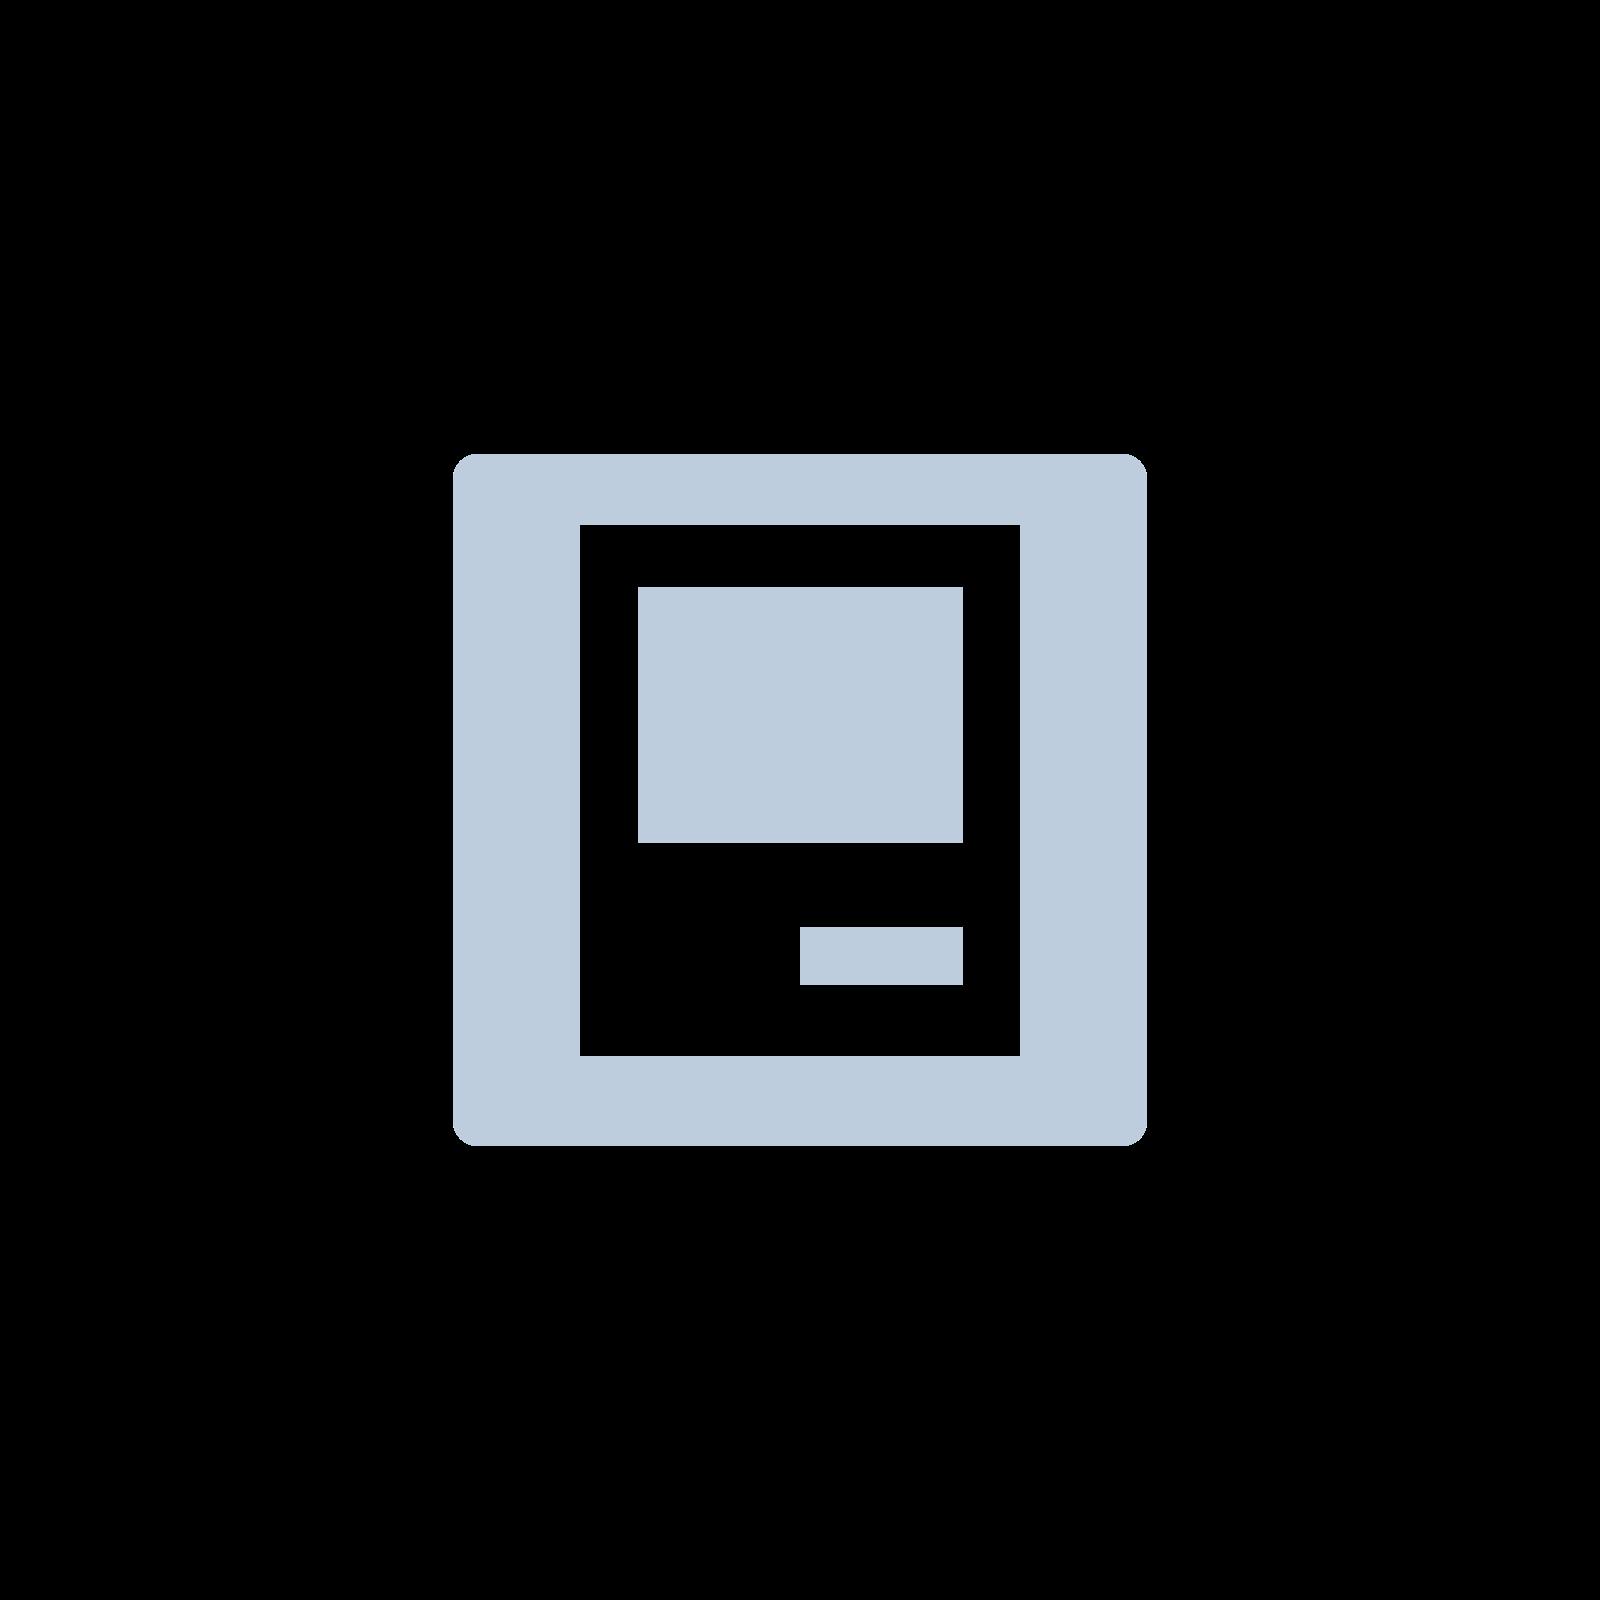 Apple iPad (1. Generation) 64GB Wi-Fi + Cellular Schwarz